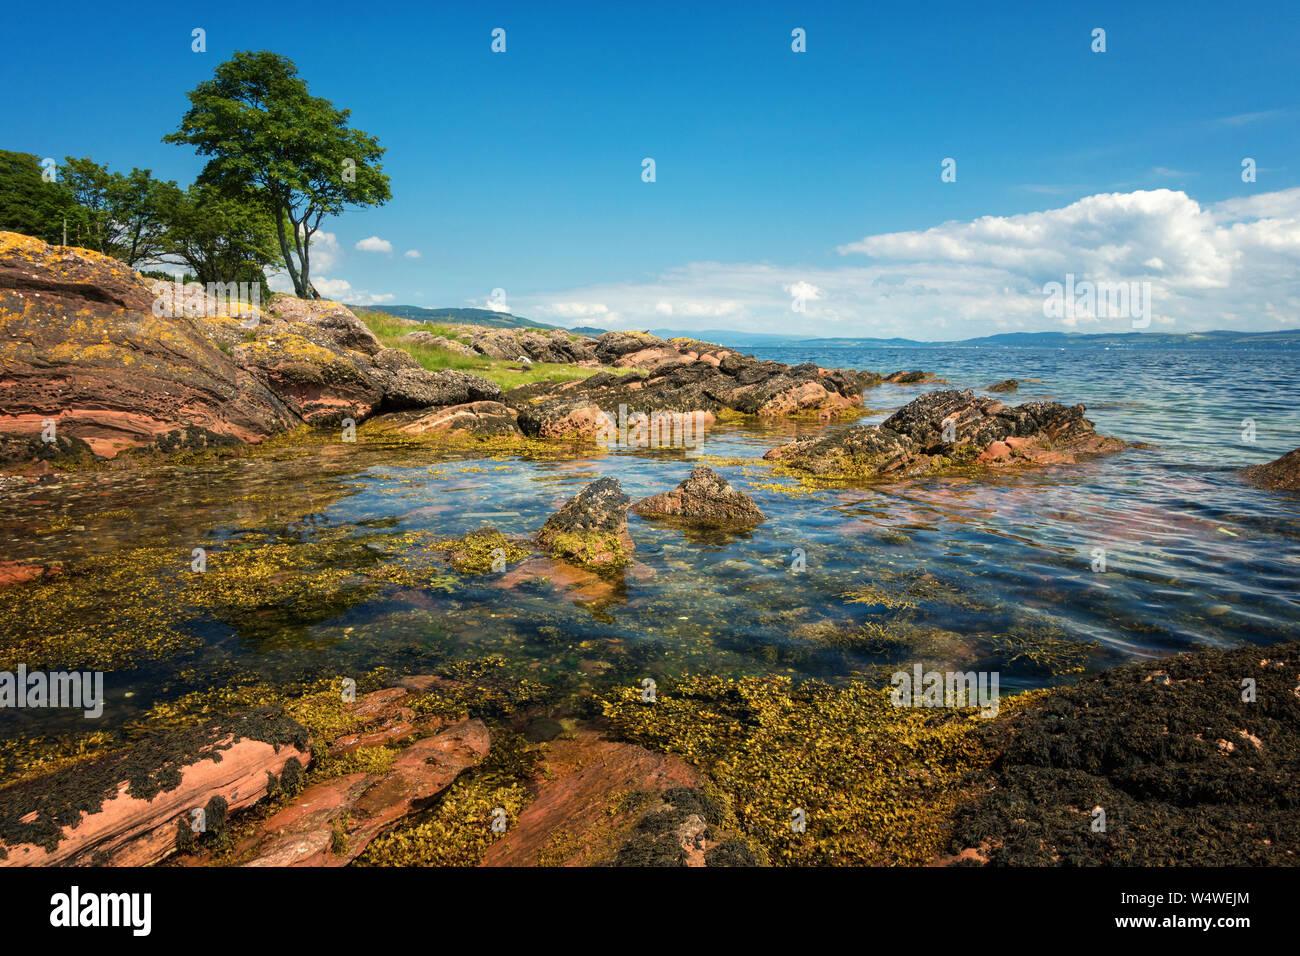 Stunning weather at Ascog beach, Isle of Bute, Scotland Stock Photo